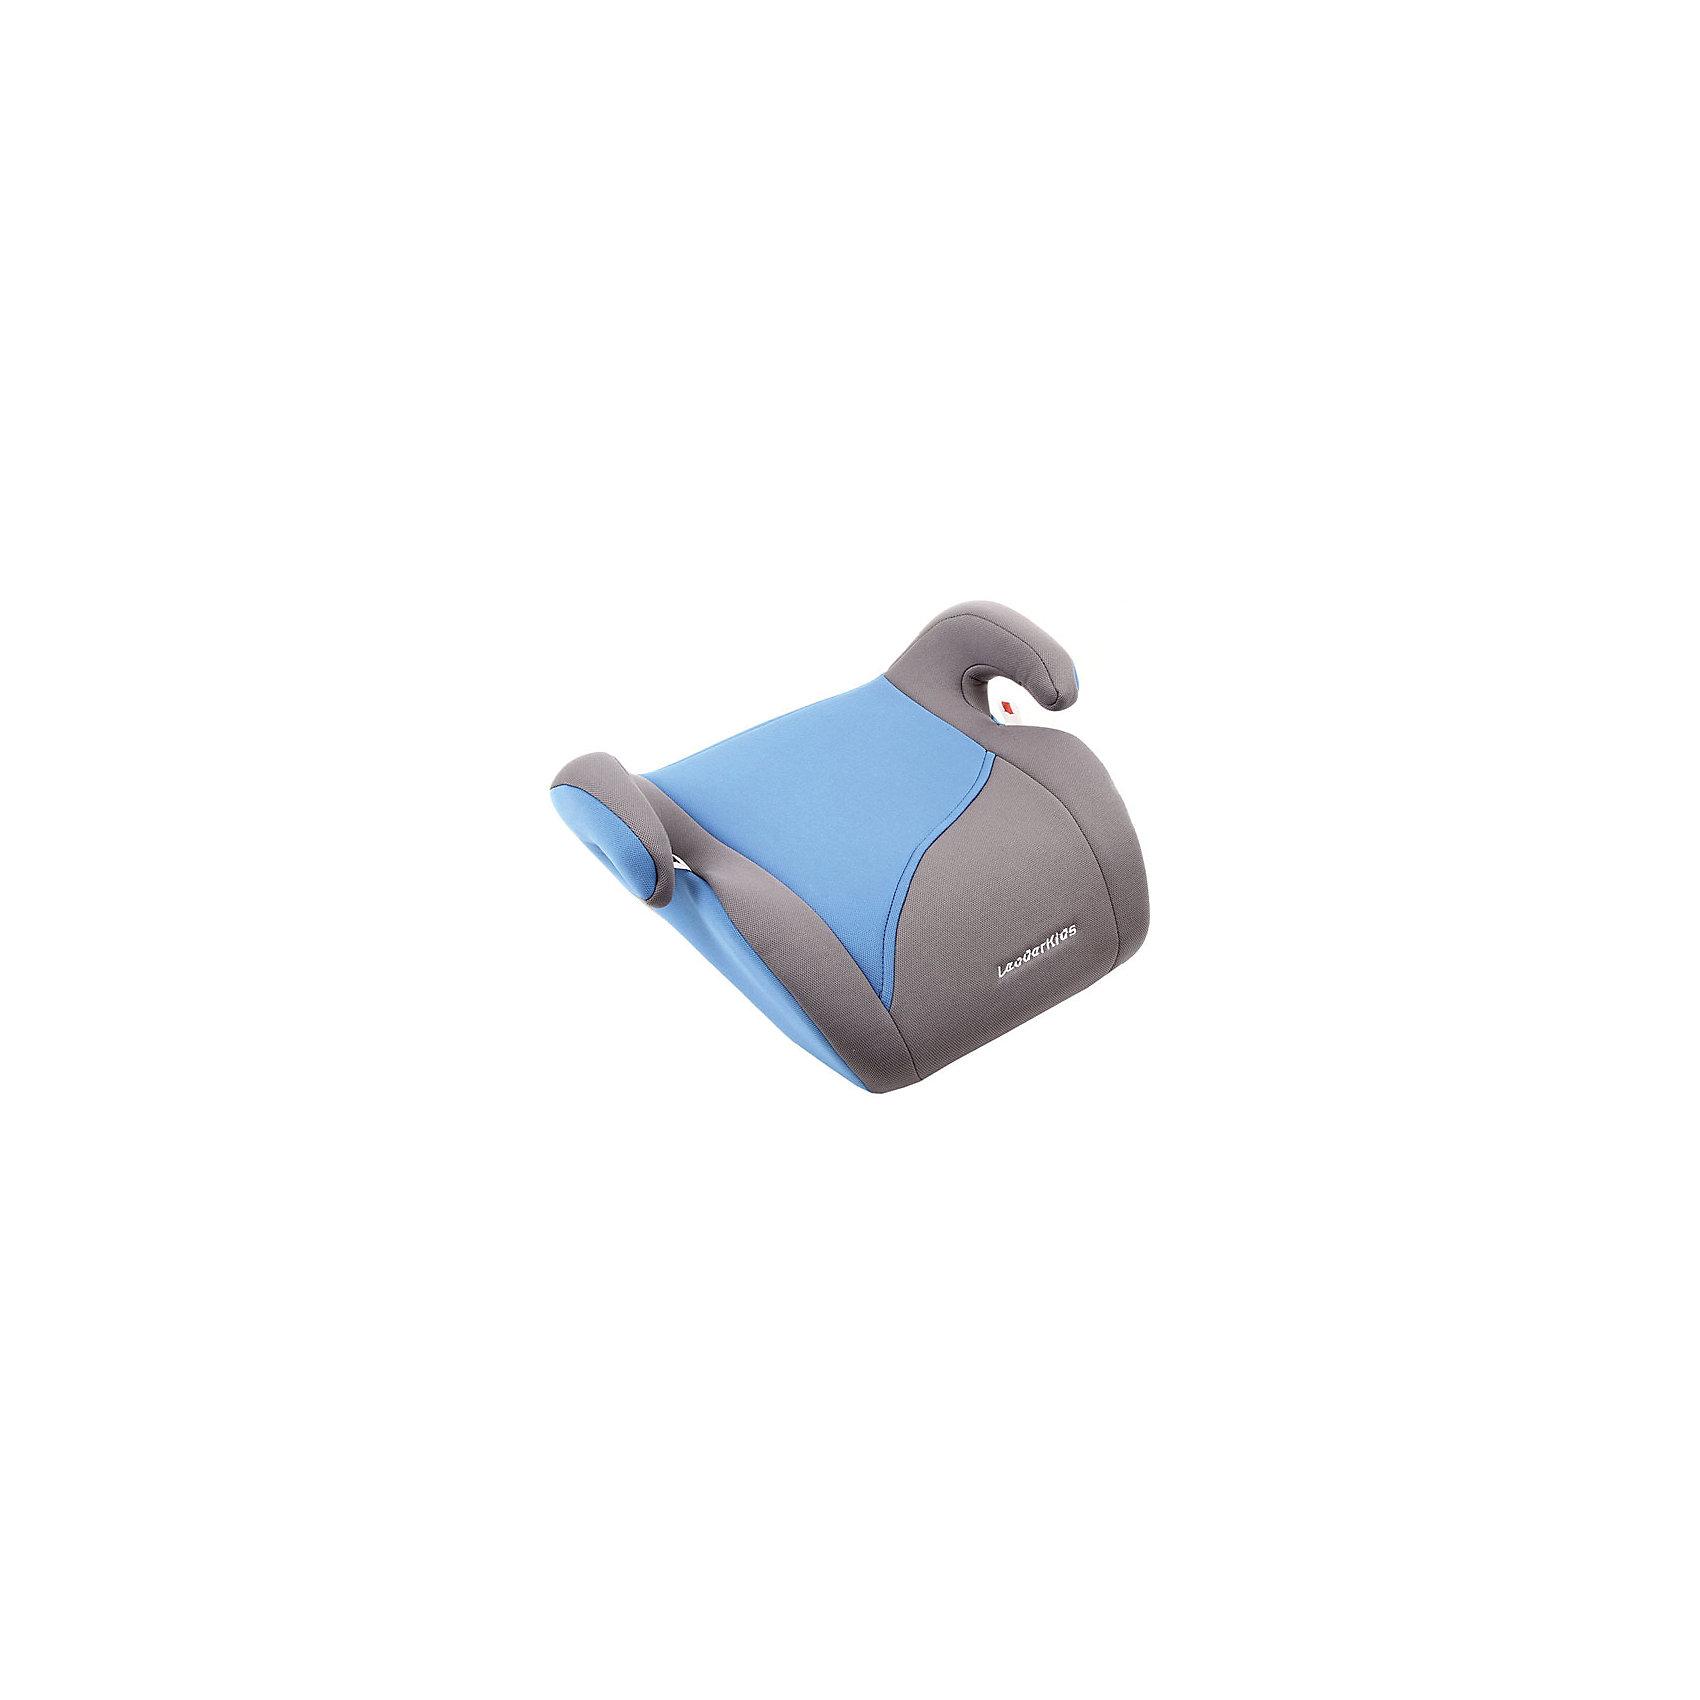 Автокресло-бустер 22-36 кг., Leader kids, серый/синий